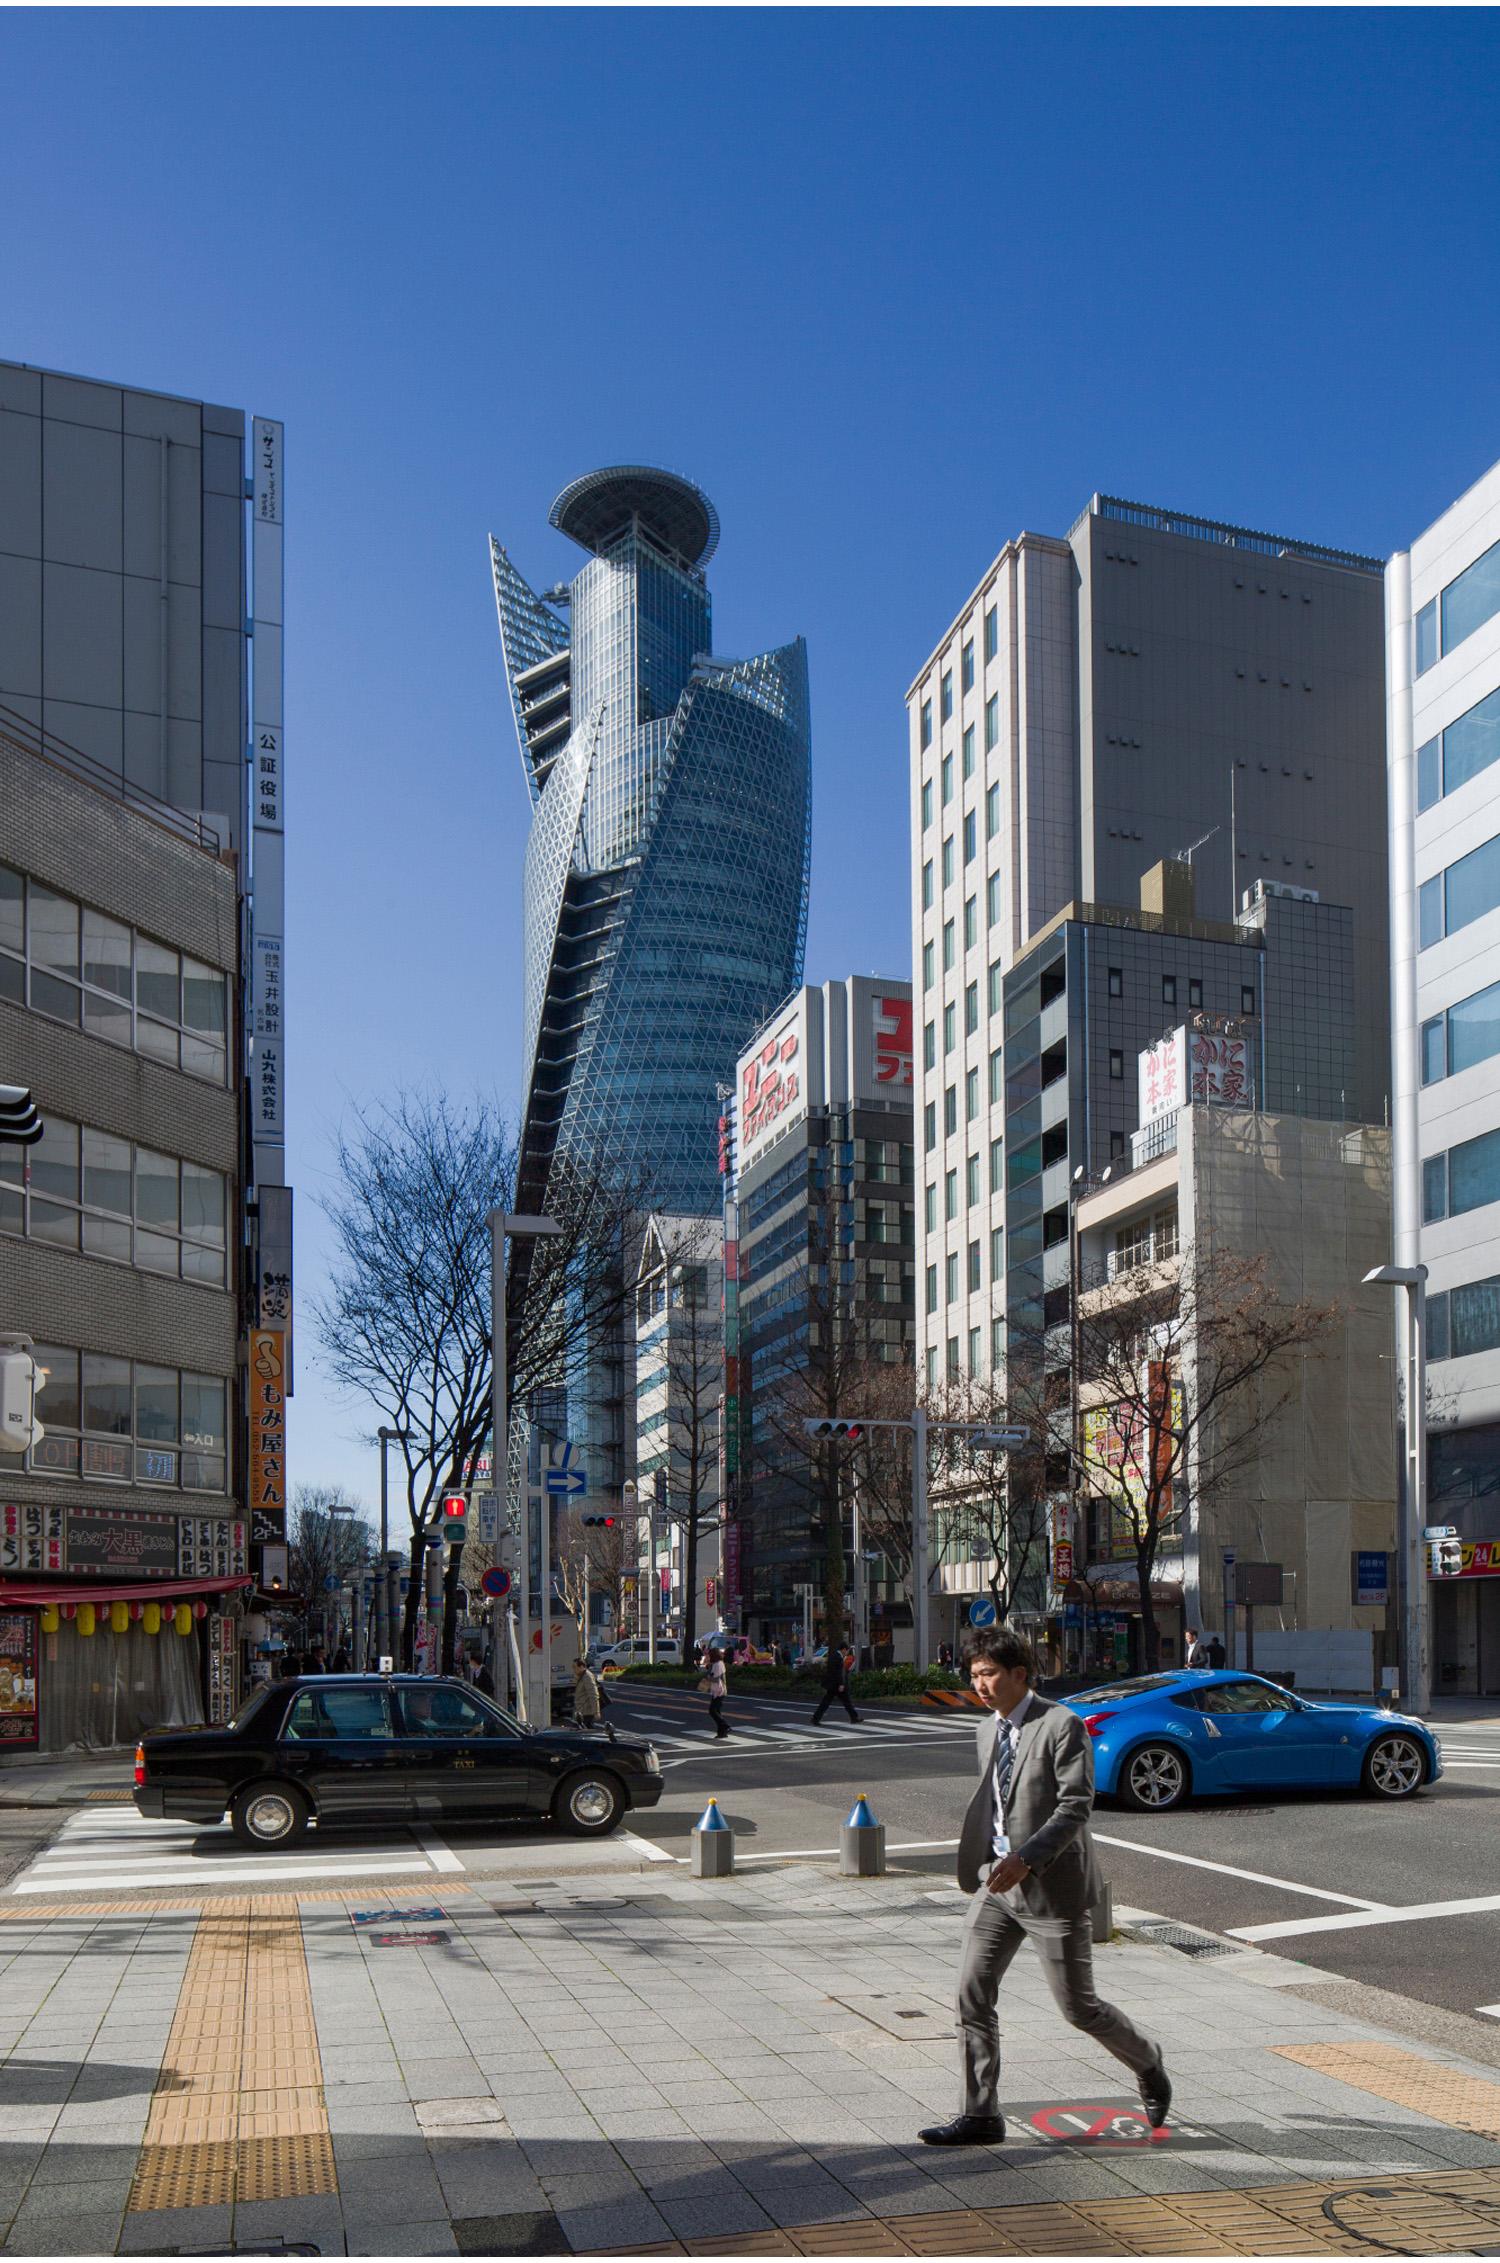 015-japan-architecture.jpg